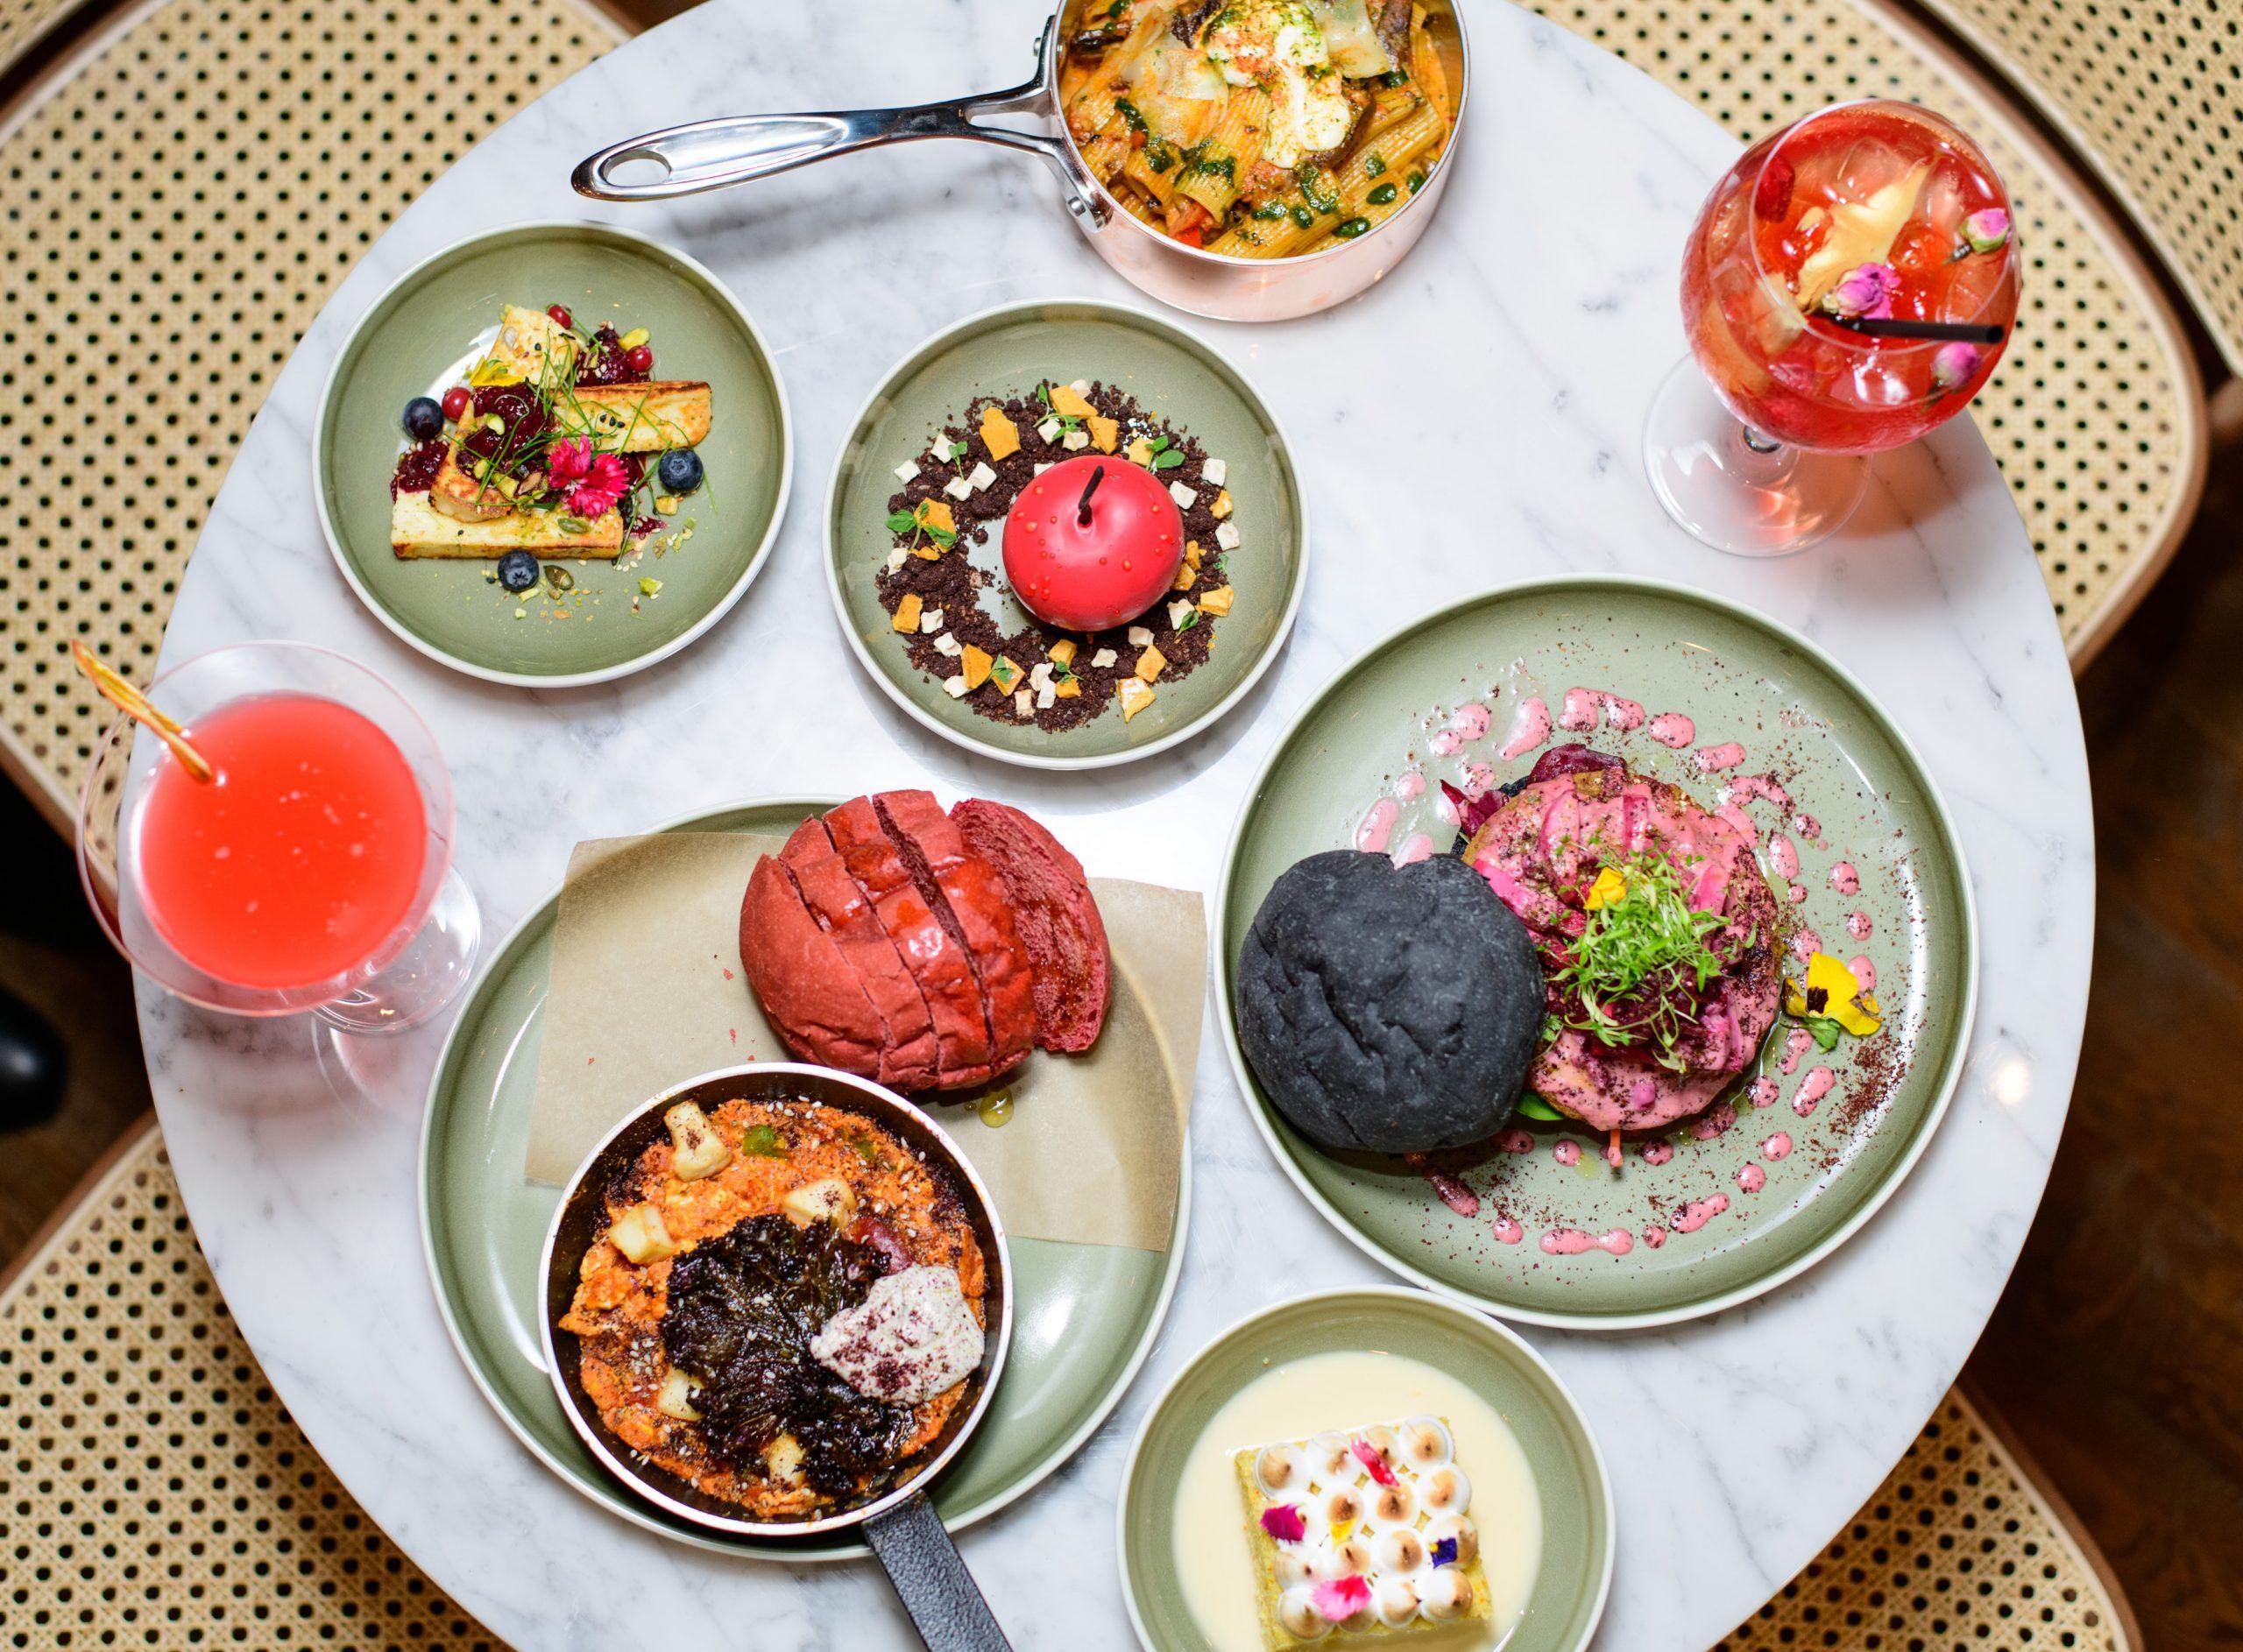 best new restaurants in London, best new restaurants in London 2020, best new restaurants in London january 2020, best new restaurants in London for January 2020